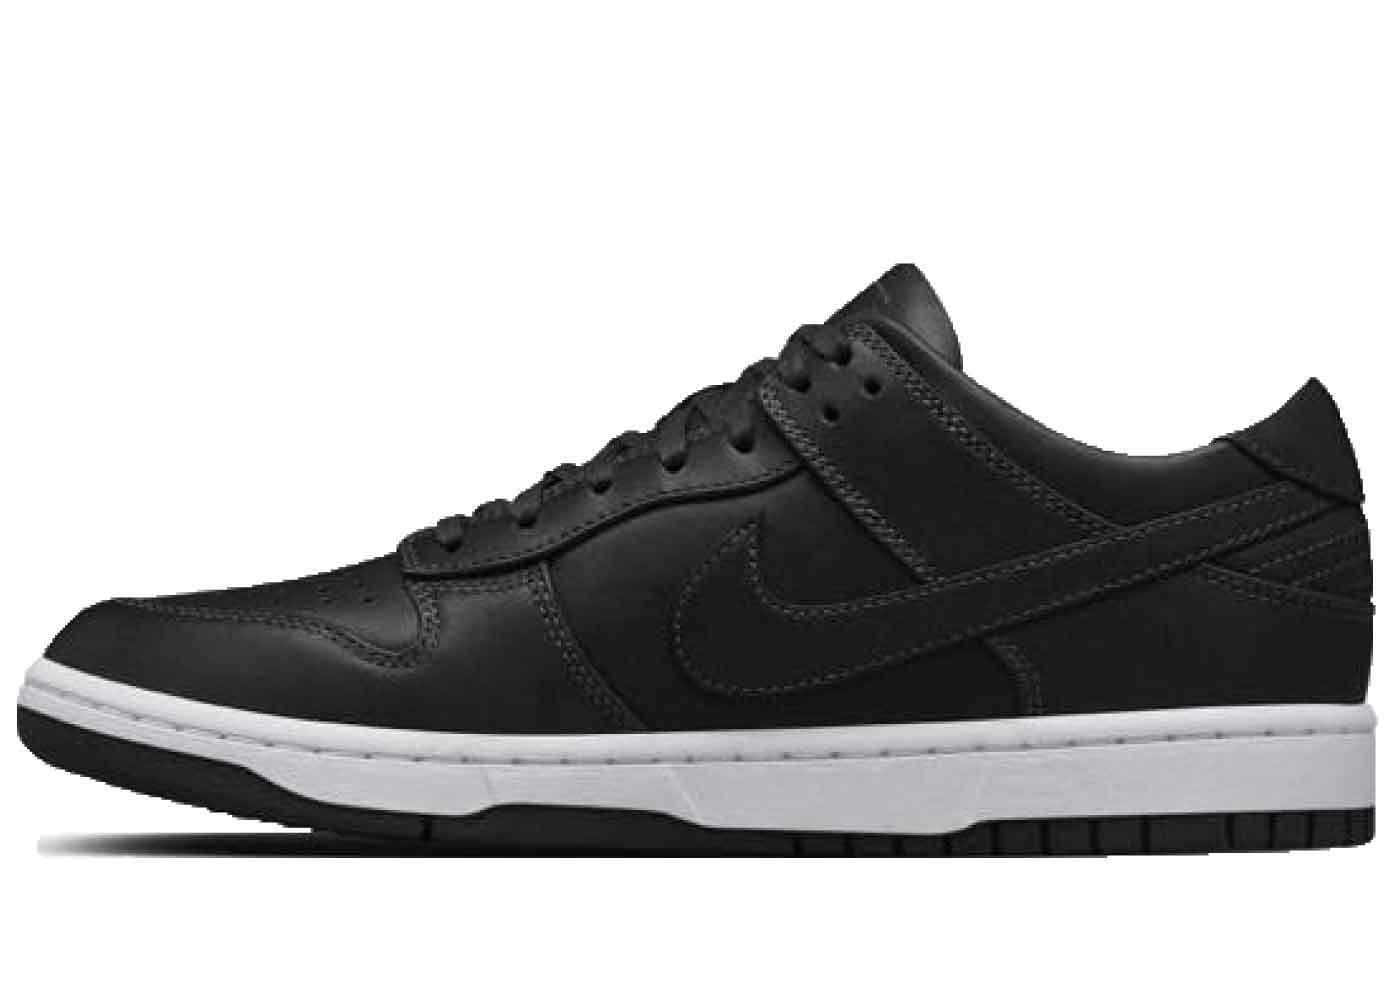 Nike Dunk Low Lux Black Whiteの写真